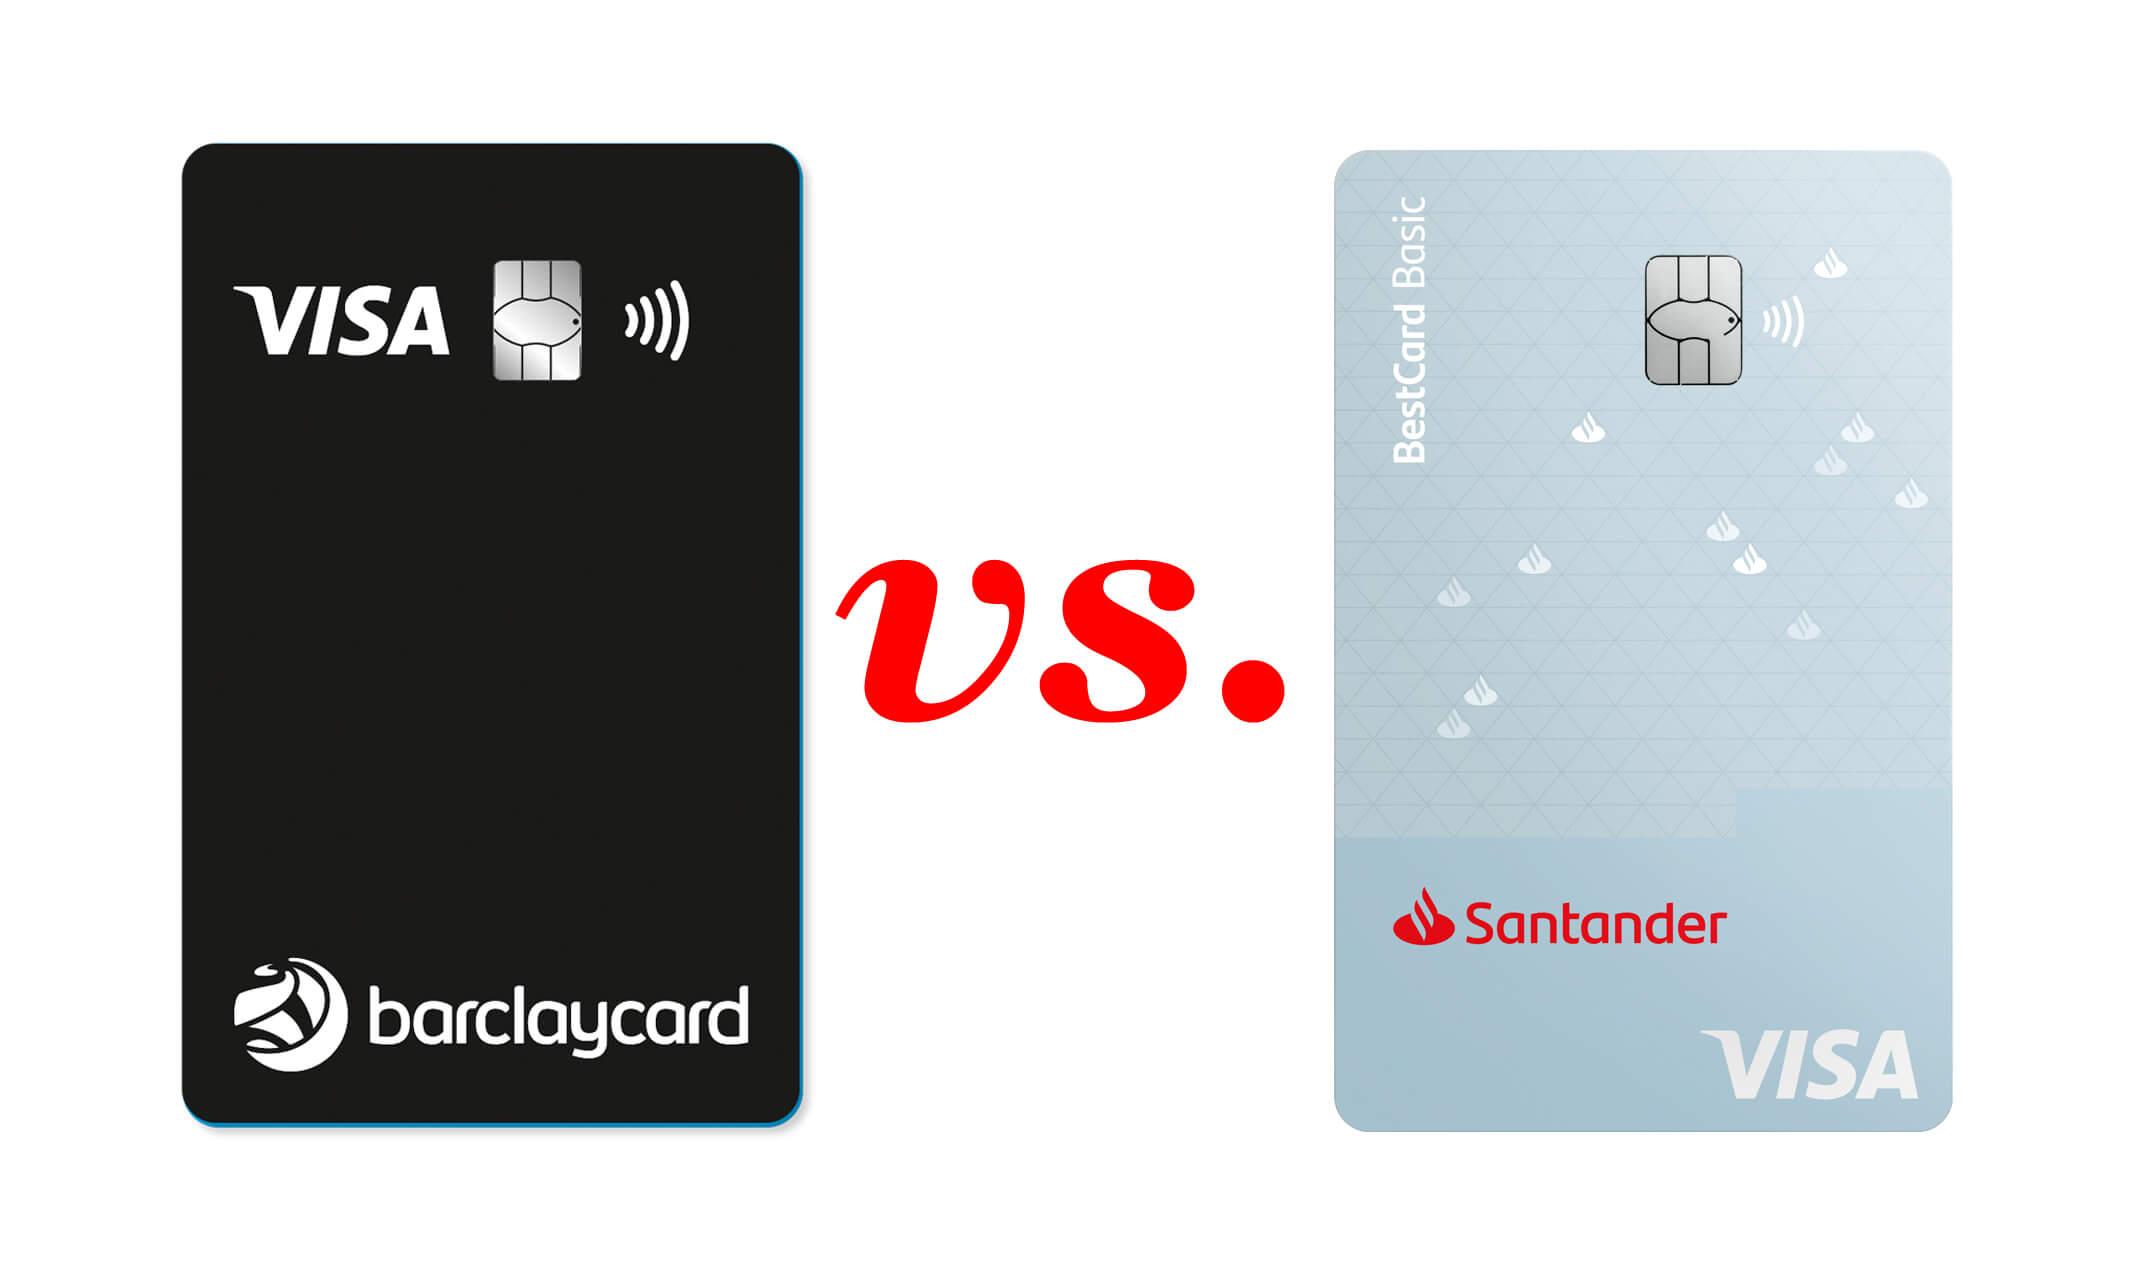 Vergleich: Barclaycard Visa vs. Santander BestCard Basic